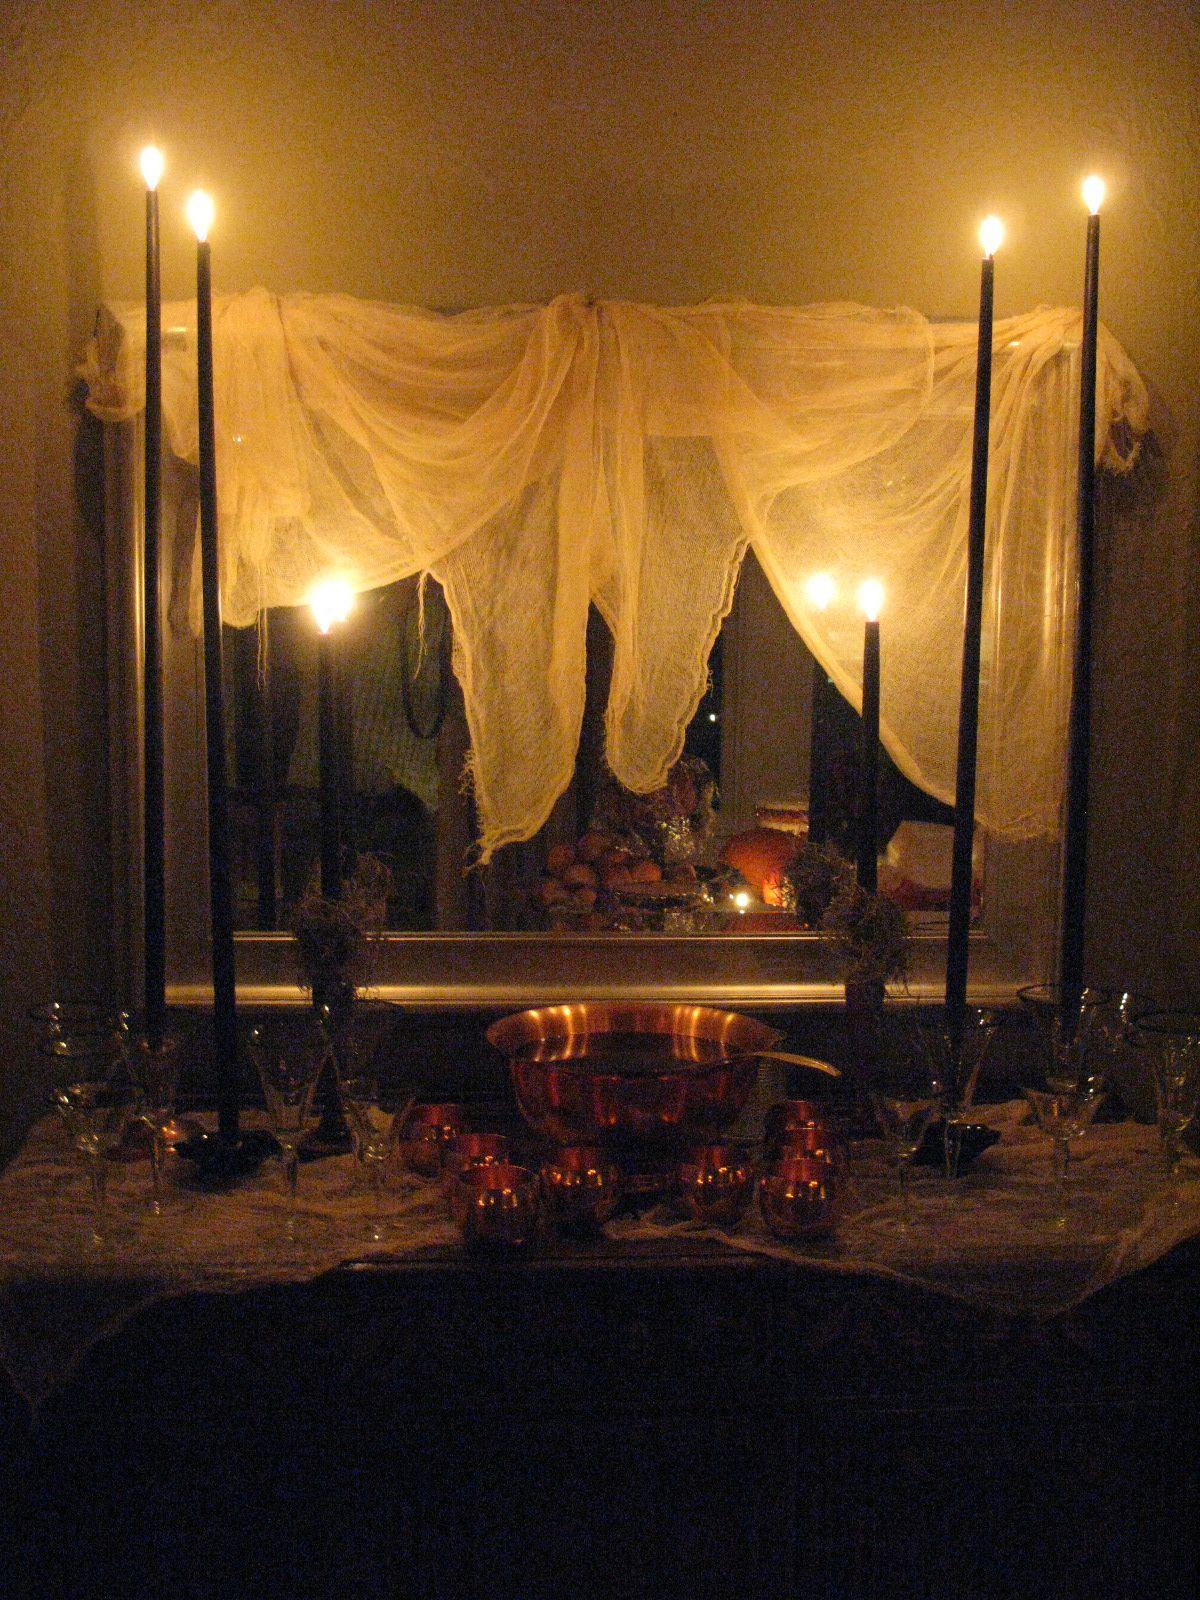 Sleepy Hollow Halloween Makeover Via Eddie Ross #Halloween #Yardhaunt #Halloweendecor